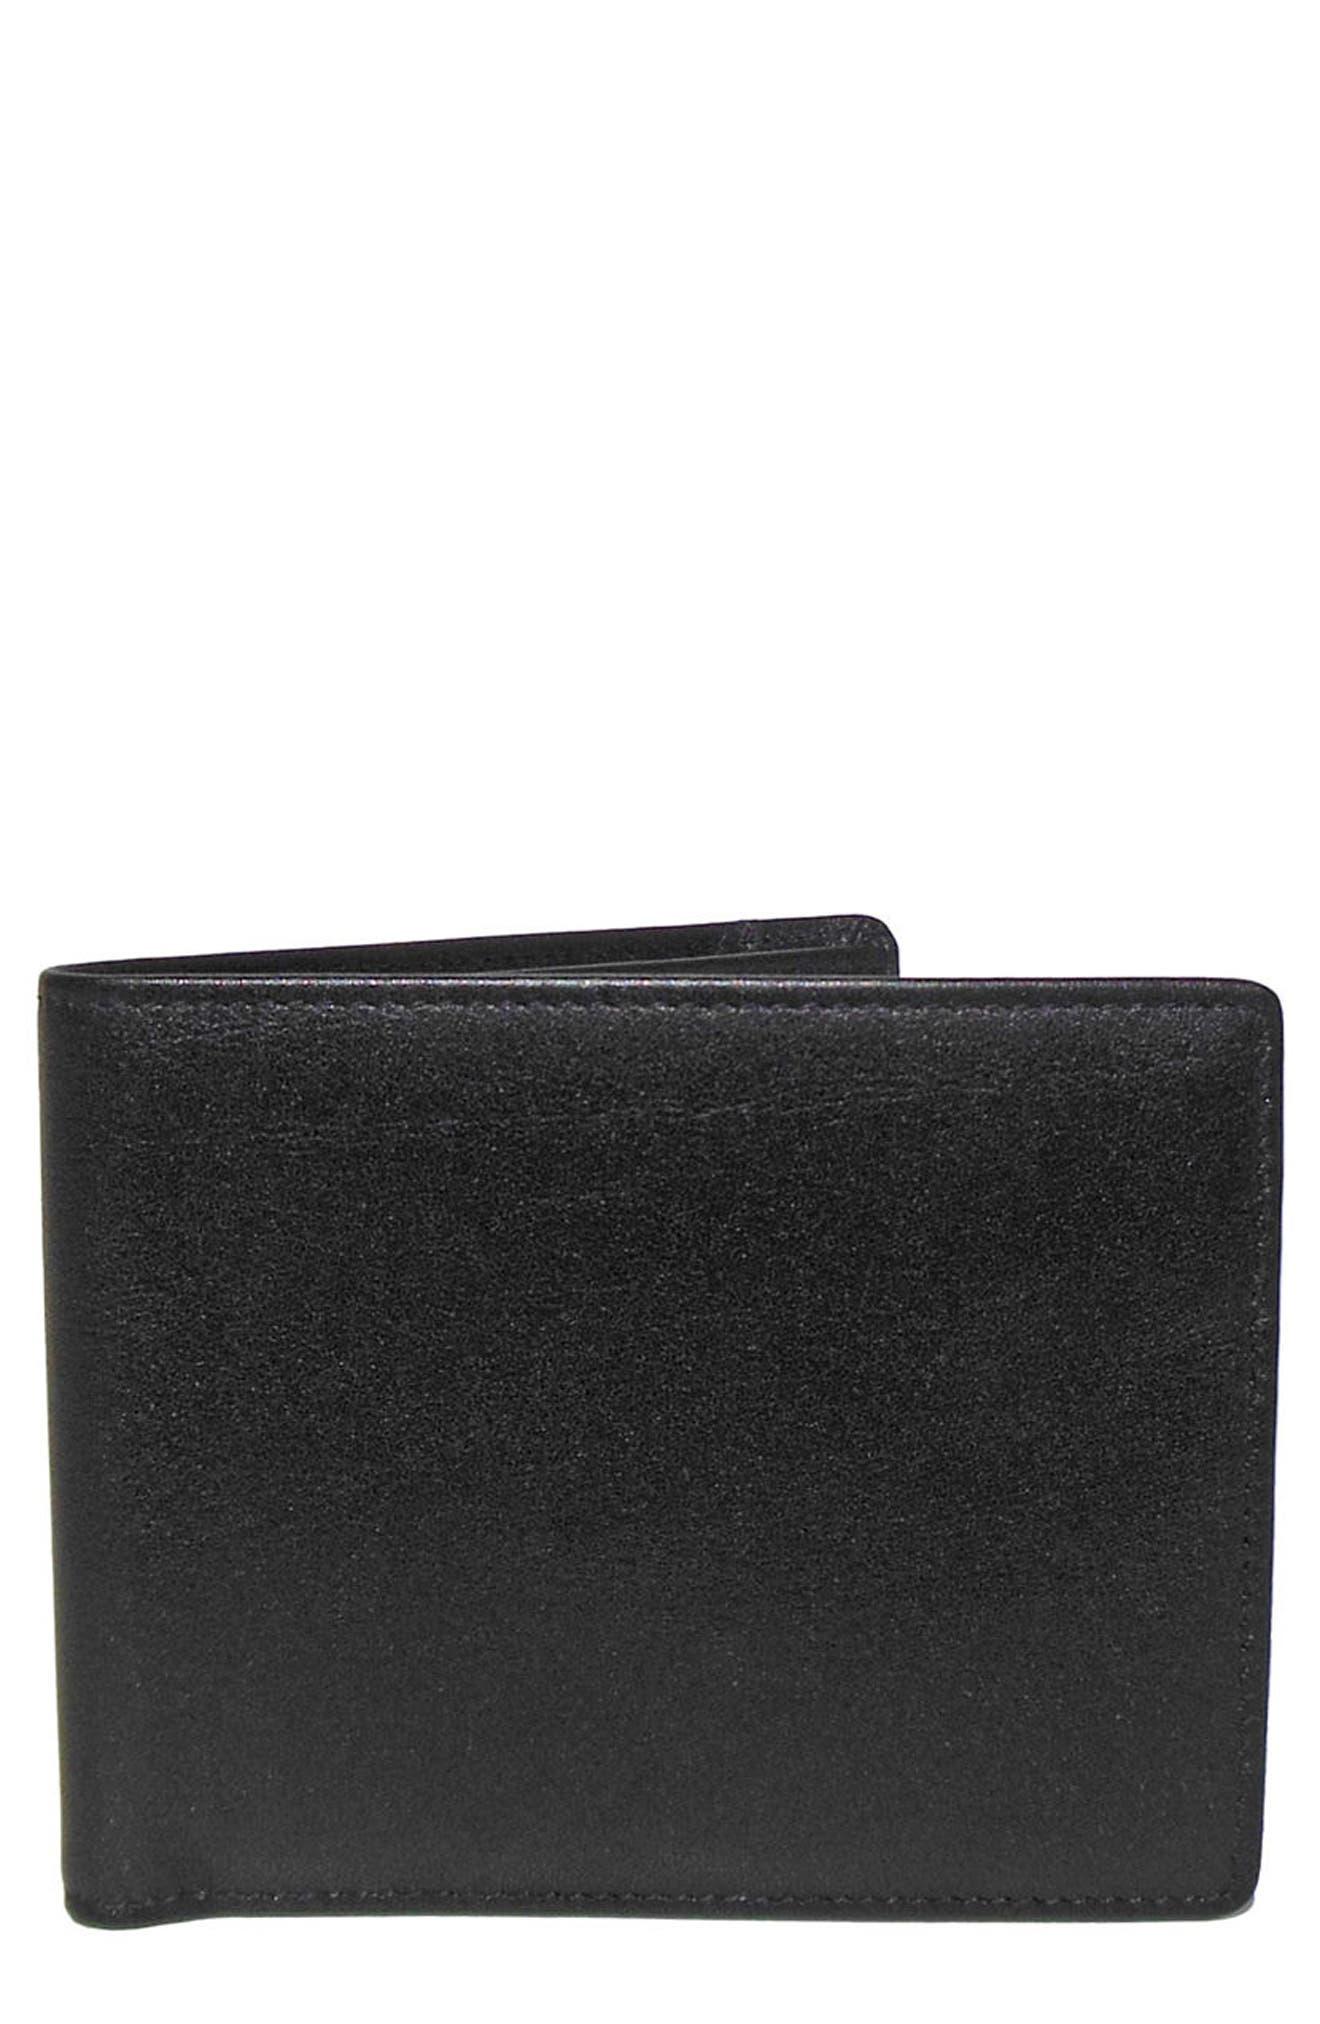 Grant Leather Wallet,                             Main thumbnail 1, color,                             Black